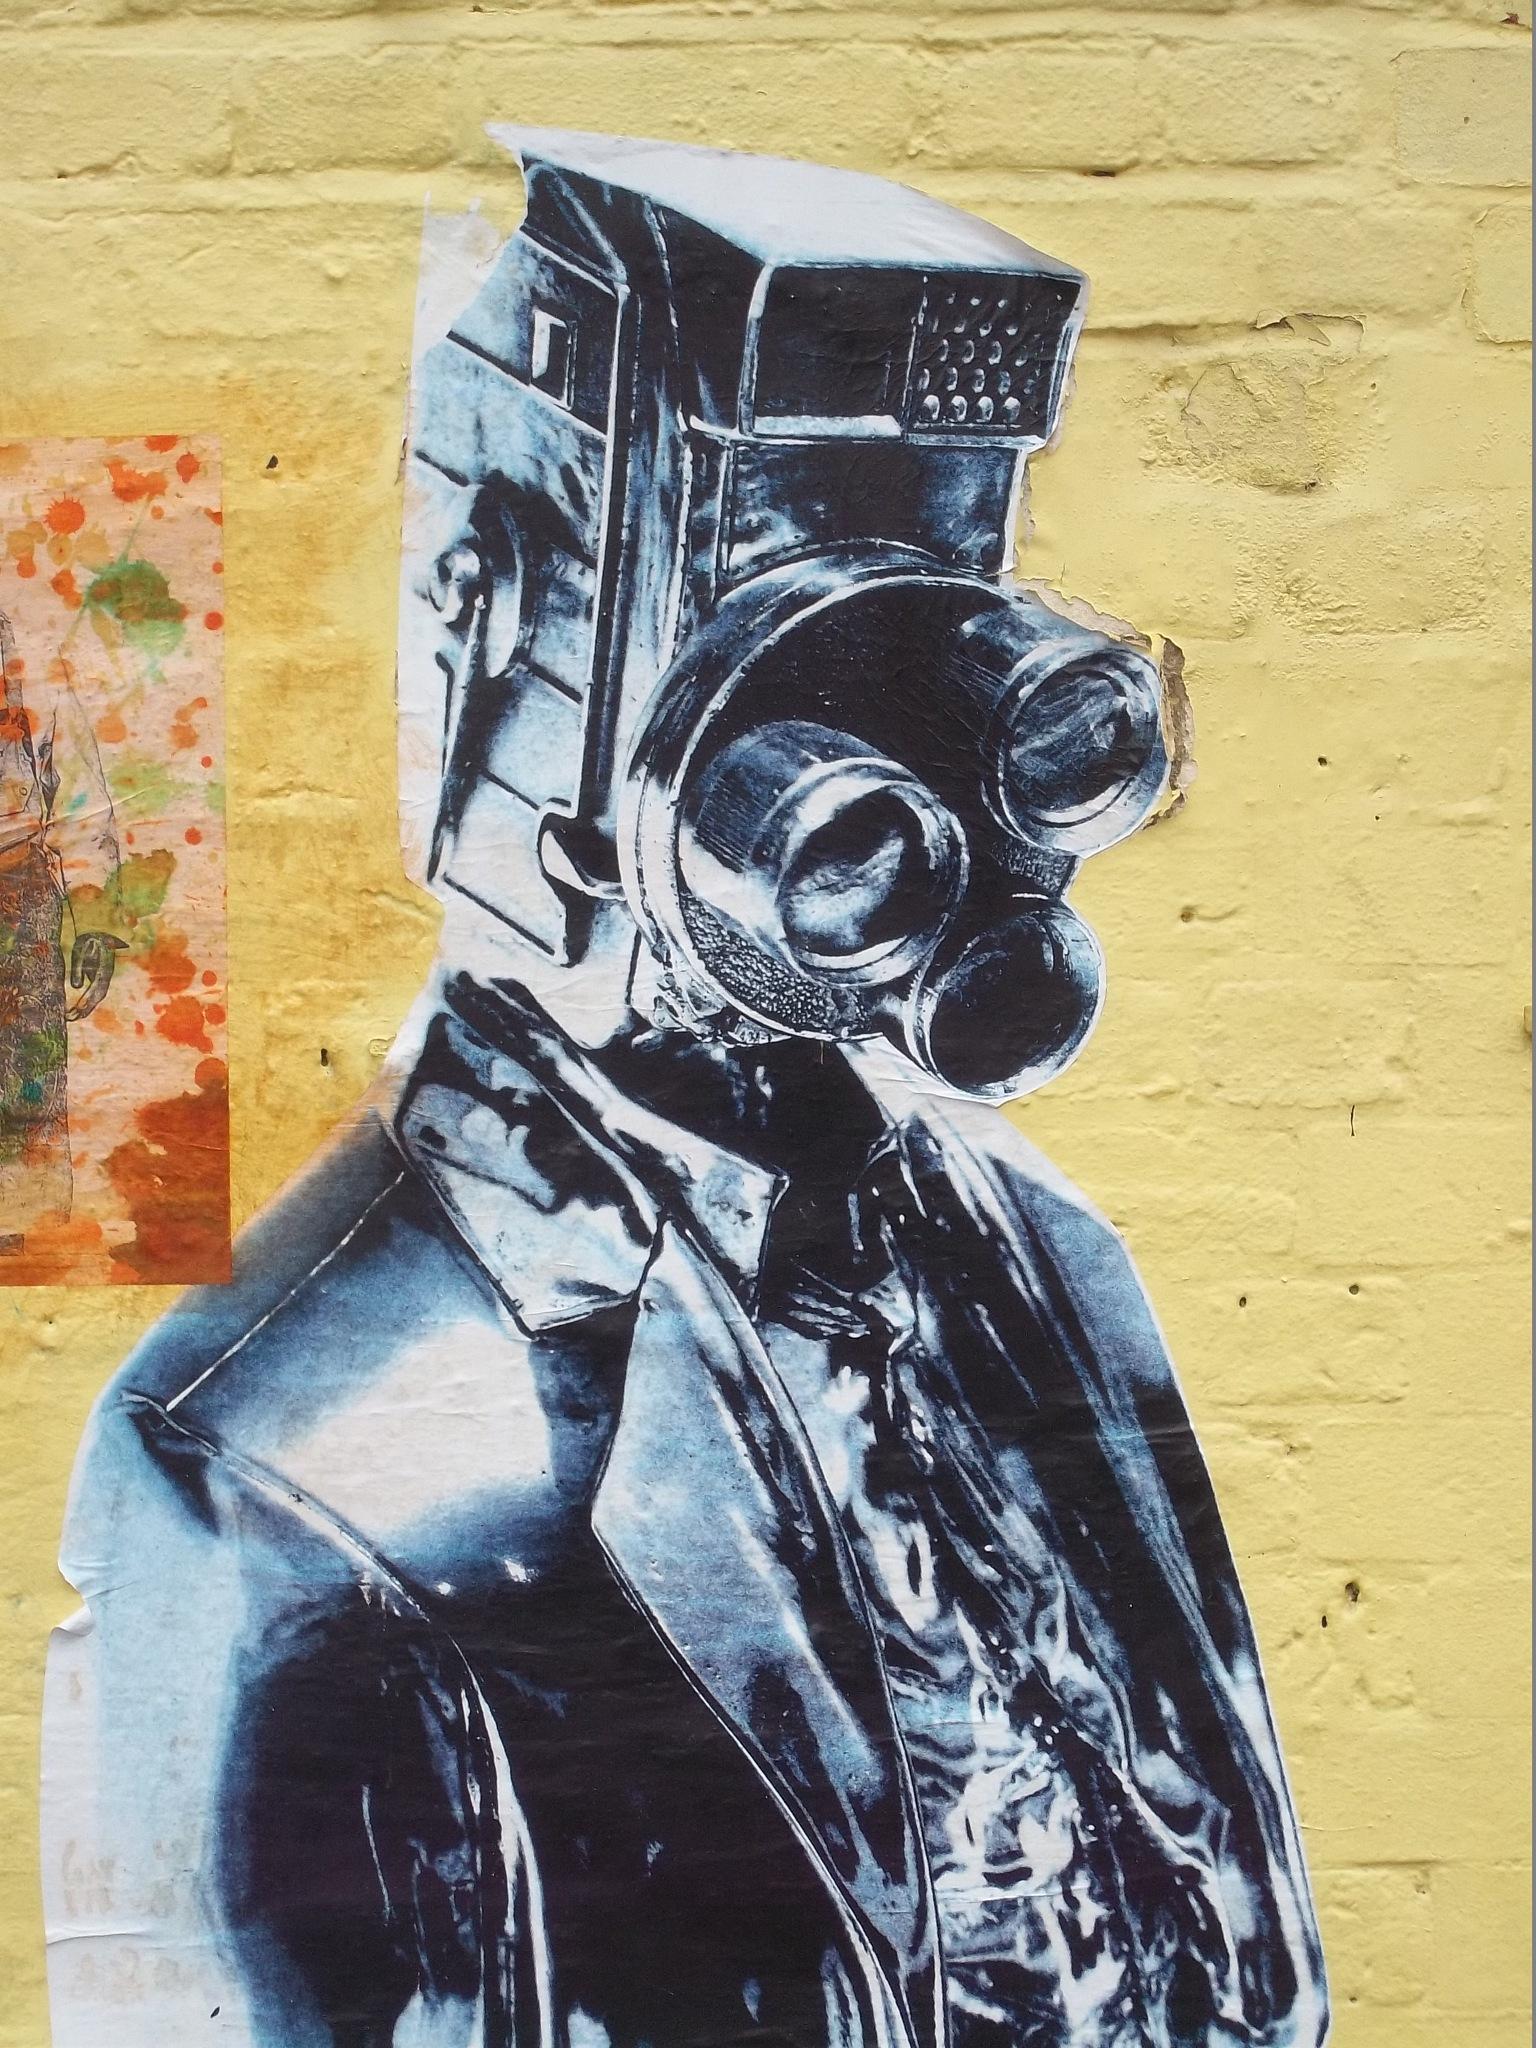 Camden wall art   by traceybiddlecombe3666